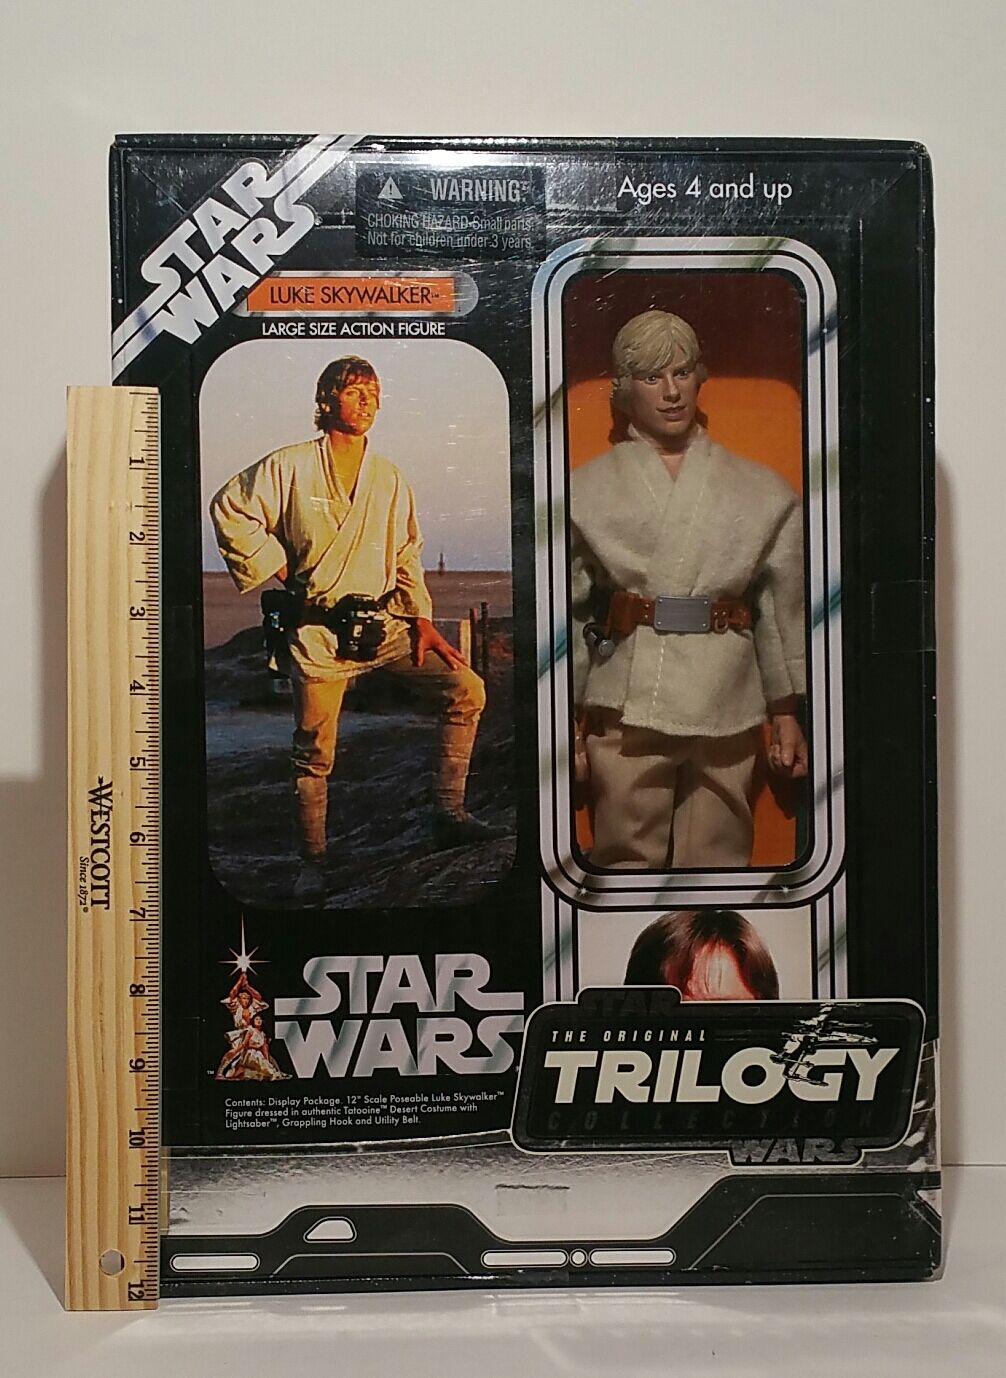 Star - wars - luke skywalker  tatooine  - trilogie collection 12 - 2004 mib